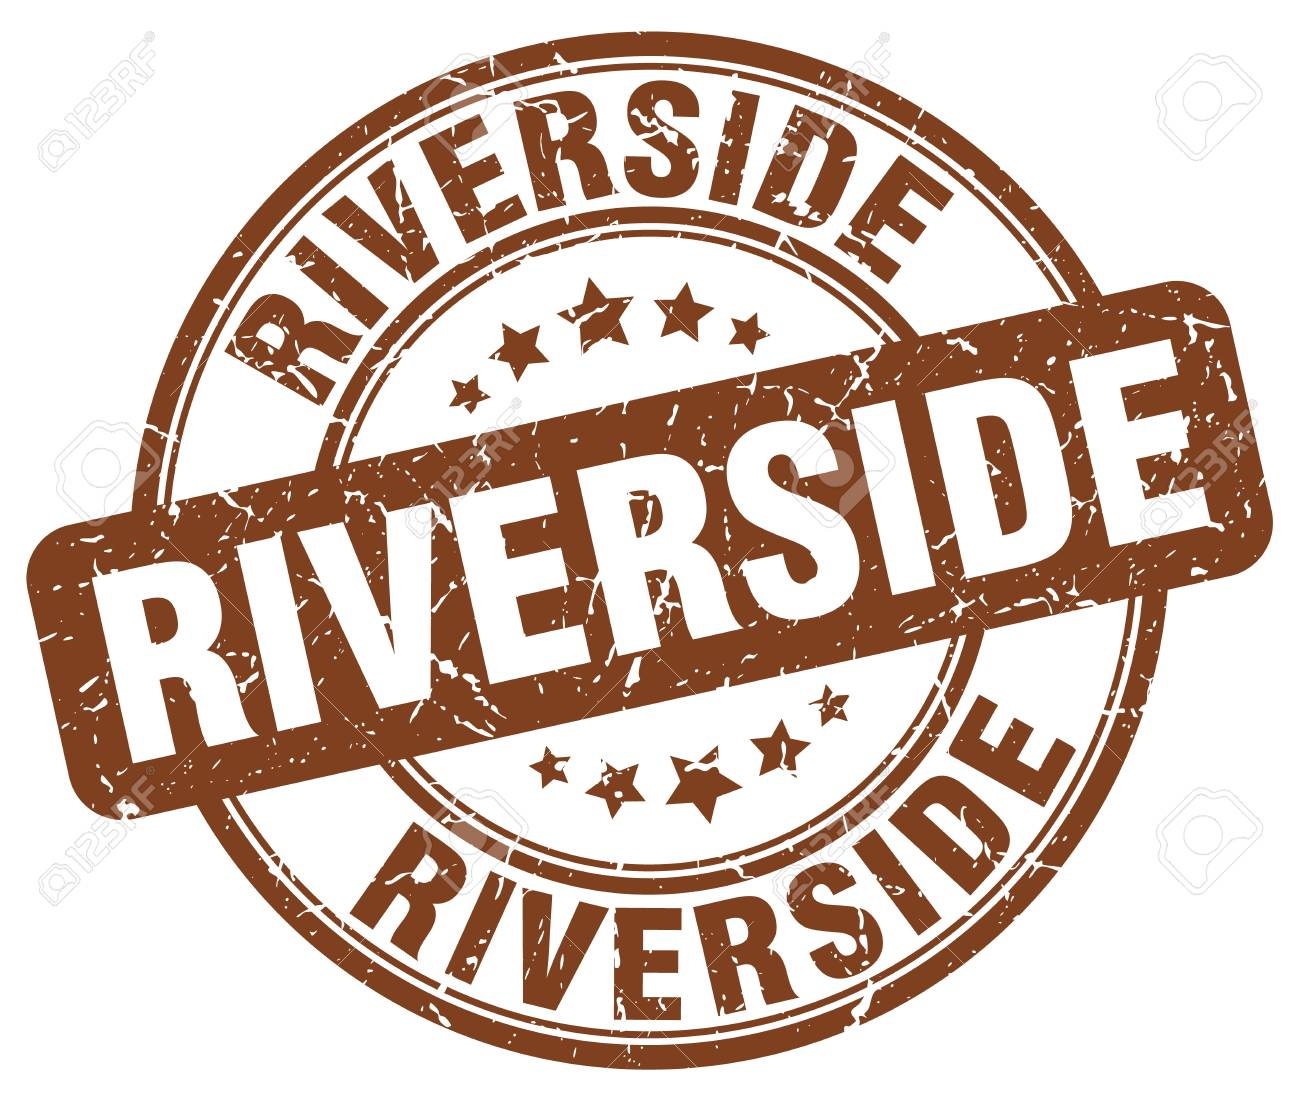 Riverside Brown Grunge Round Vintage Rubber StampRiverside